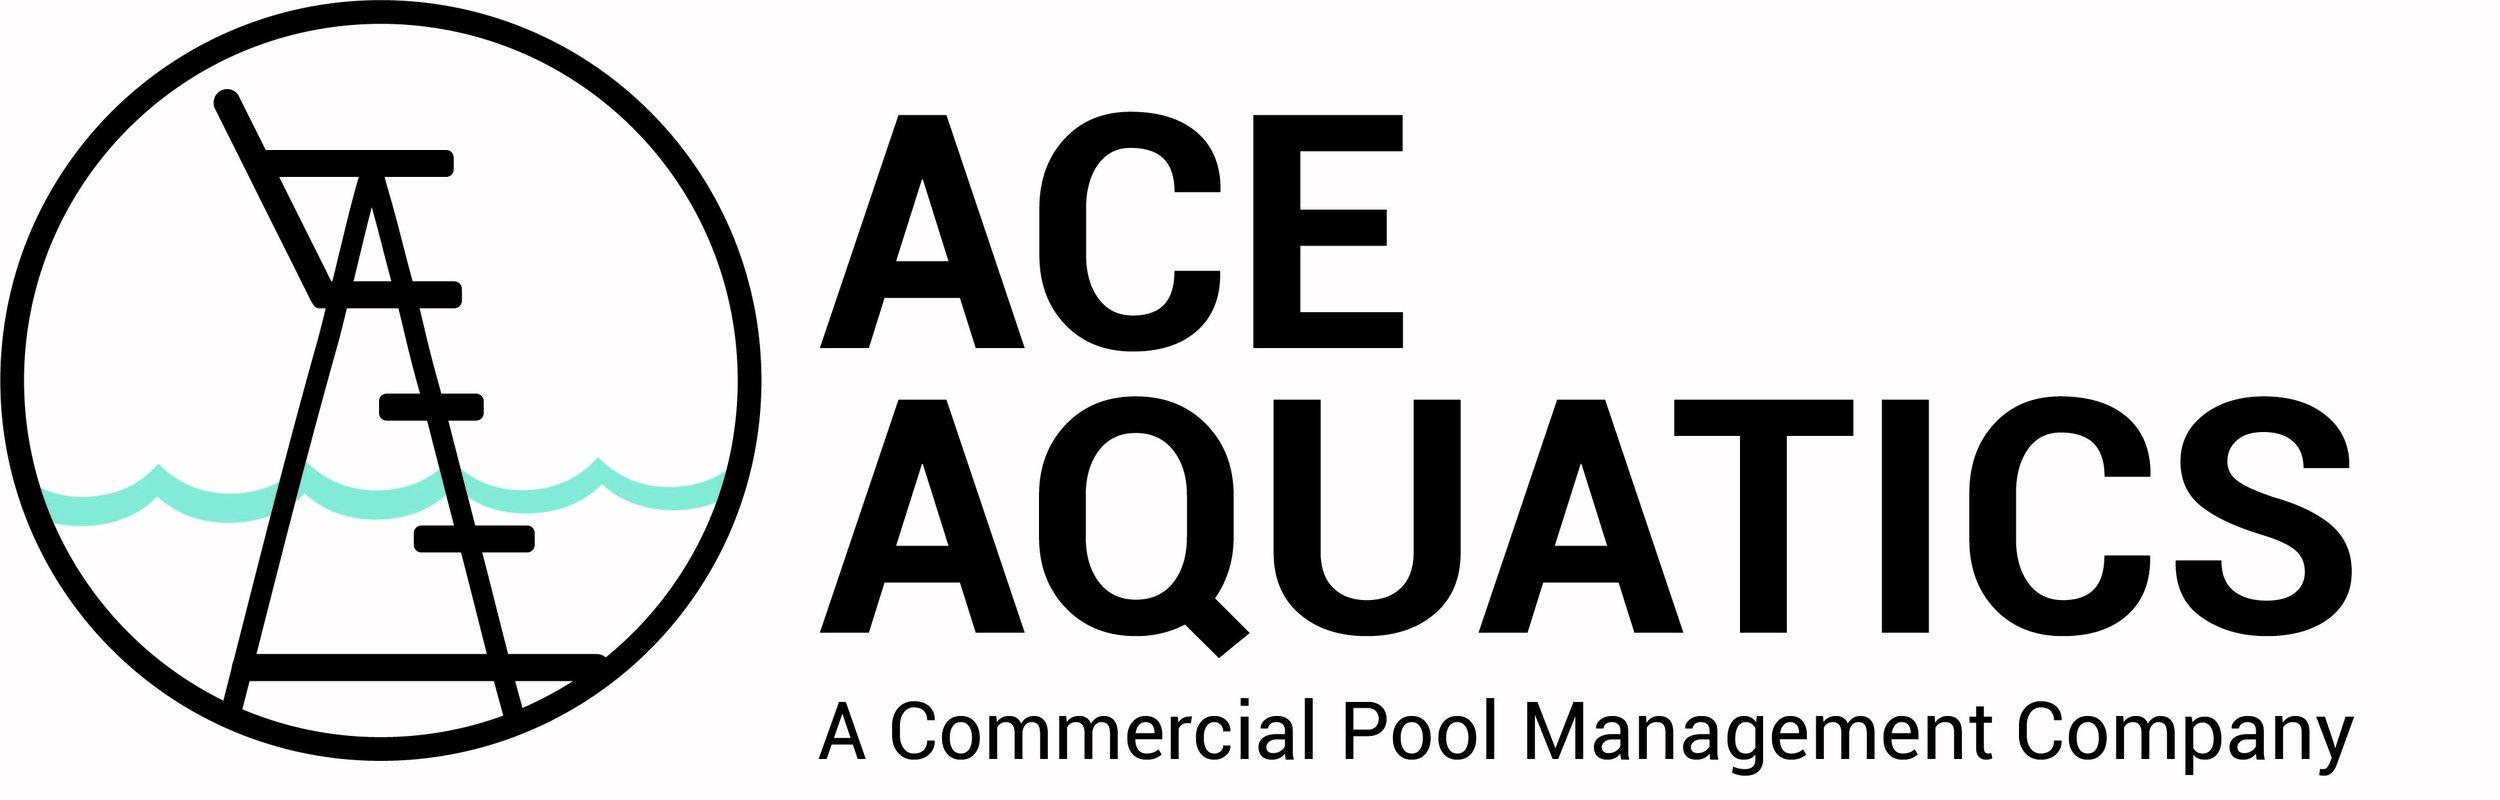 Ace_Logo_With_Black_Tagline_2019.jpg